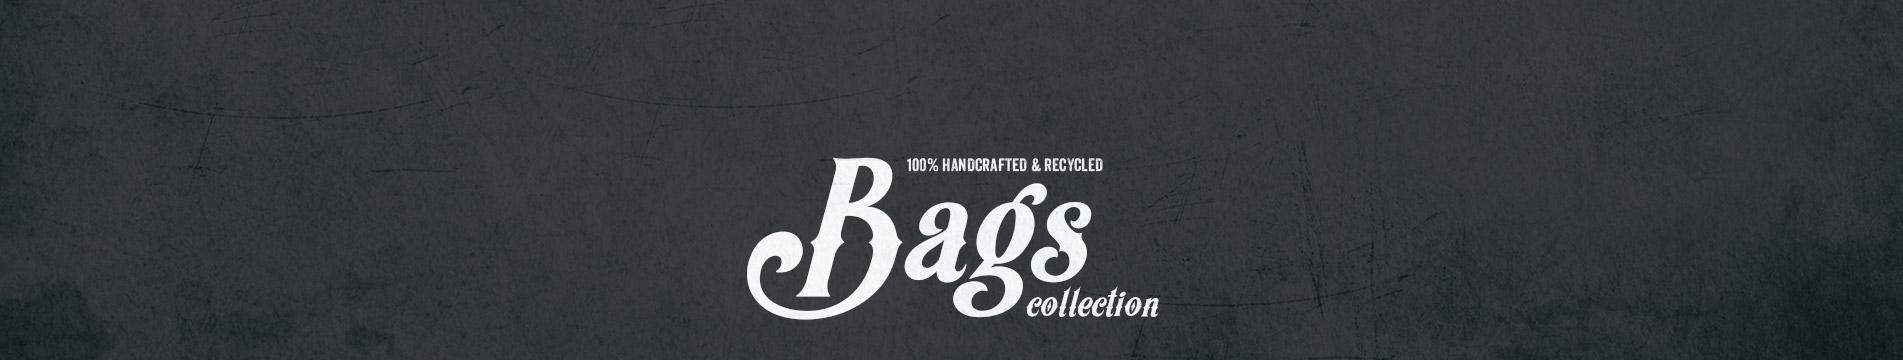 Handmade Recycled Bags